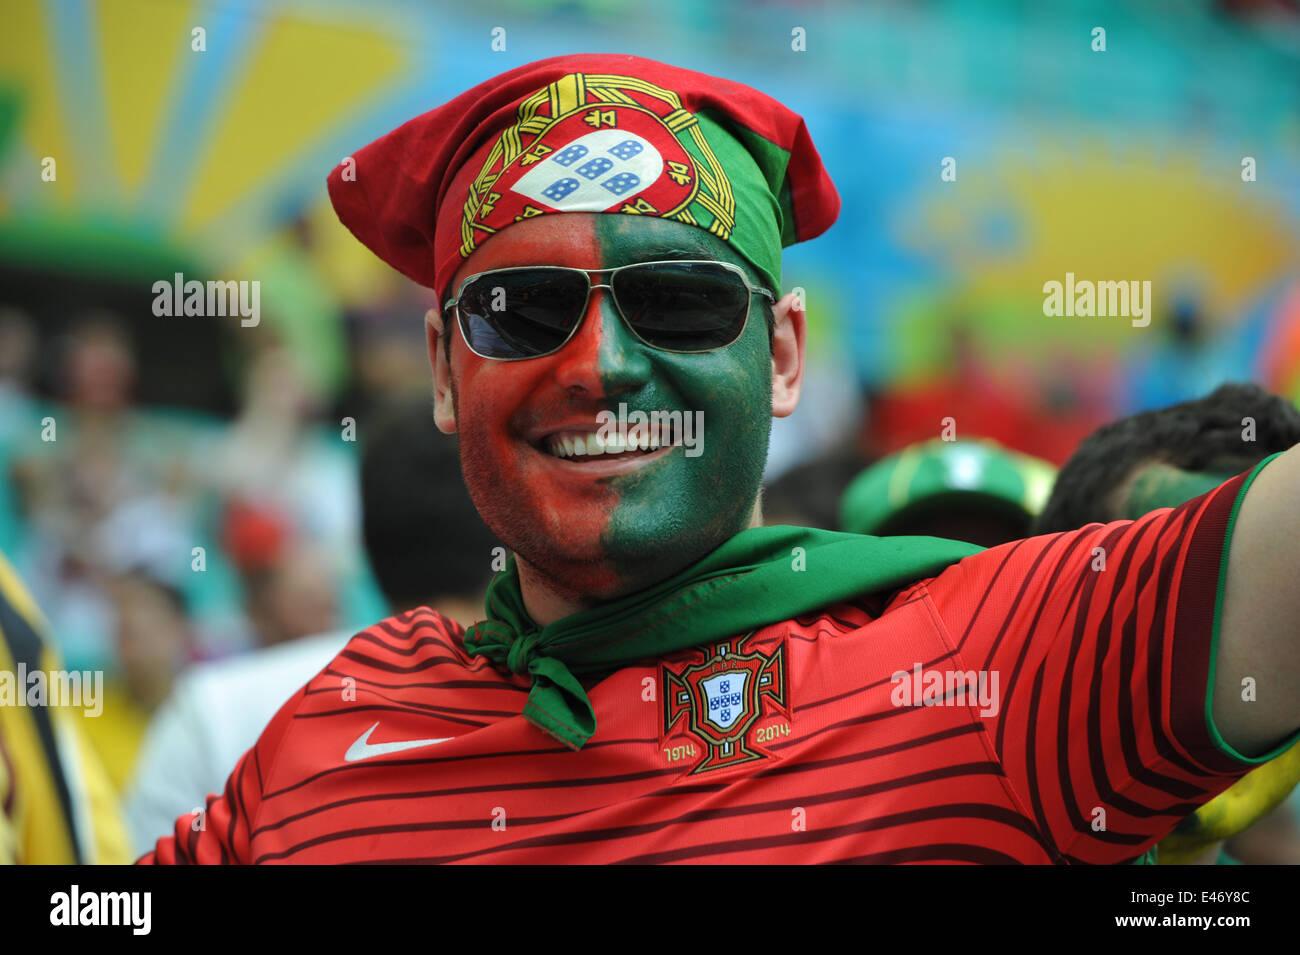 WM 2014, Salvador da Bahia, portugiesischer Fan, Deutschland vs. Portugal. Editorial use only. - Stock Image